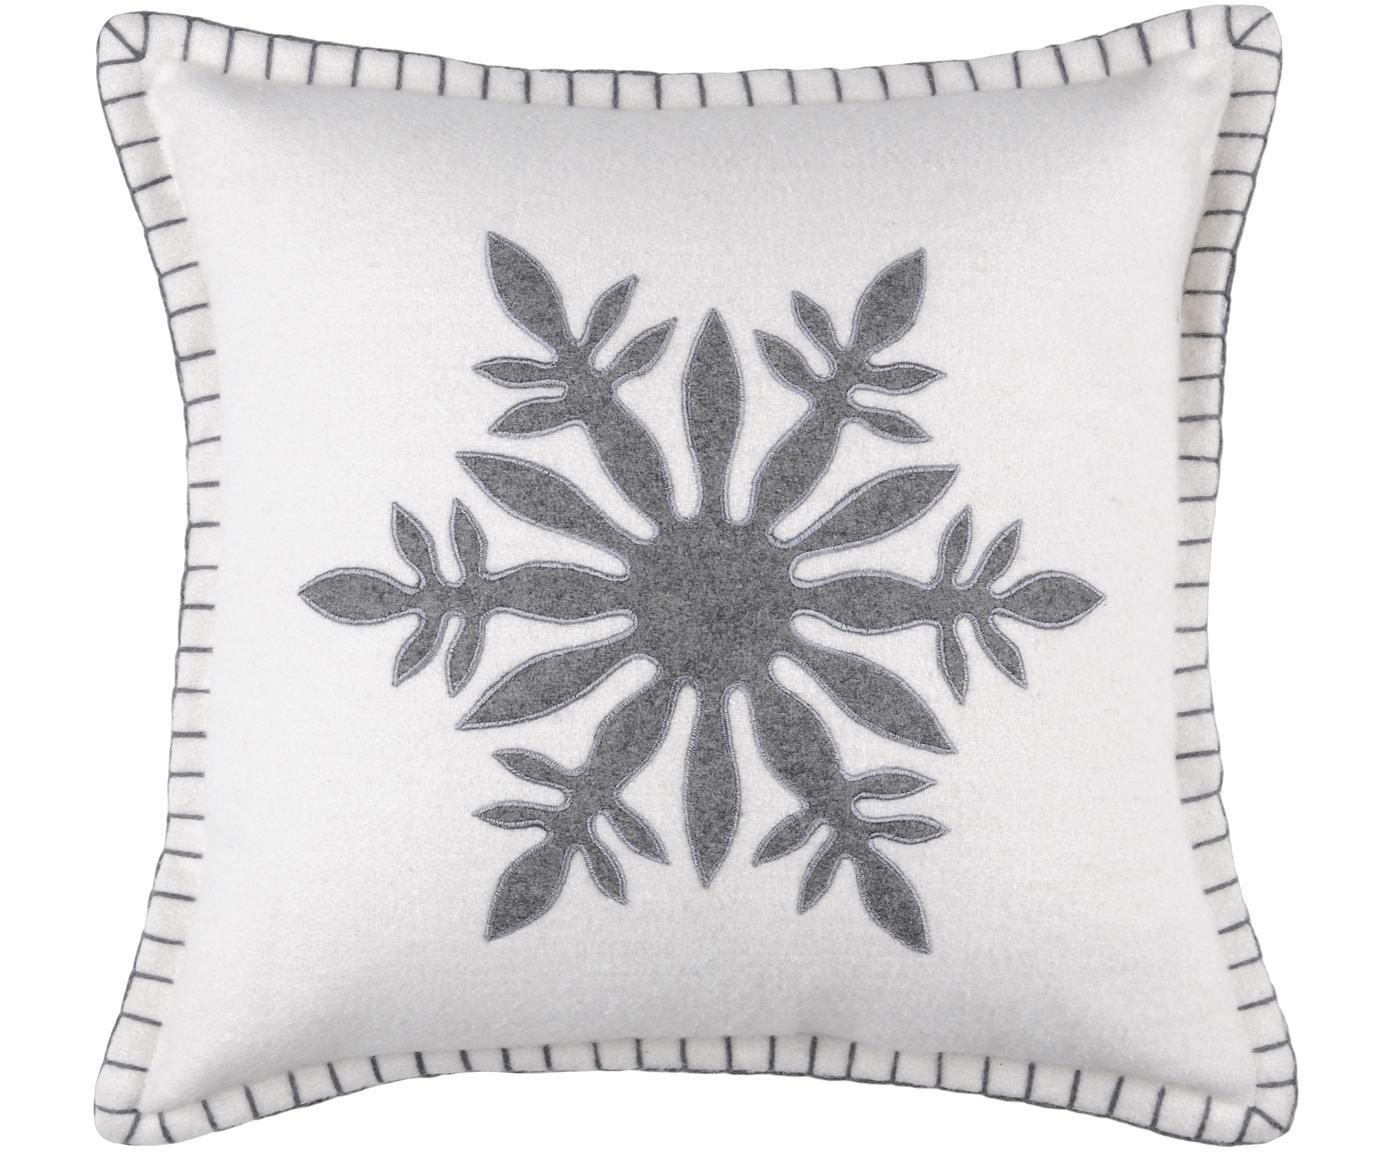 Cuscino con imbottitura Vaujany, Rivestimento: 50% cotone, 32% lana, 7% , Bianco latteo, grigio, Larg. 40 x Lung. 40 cm